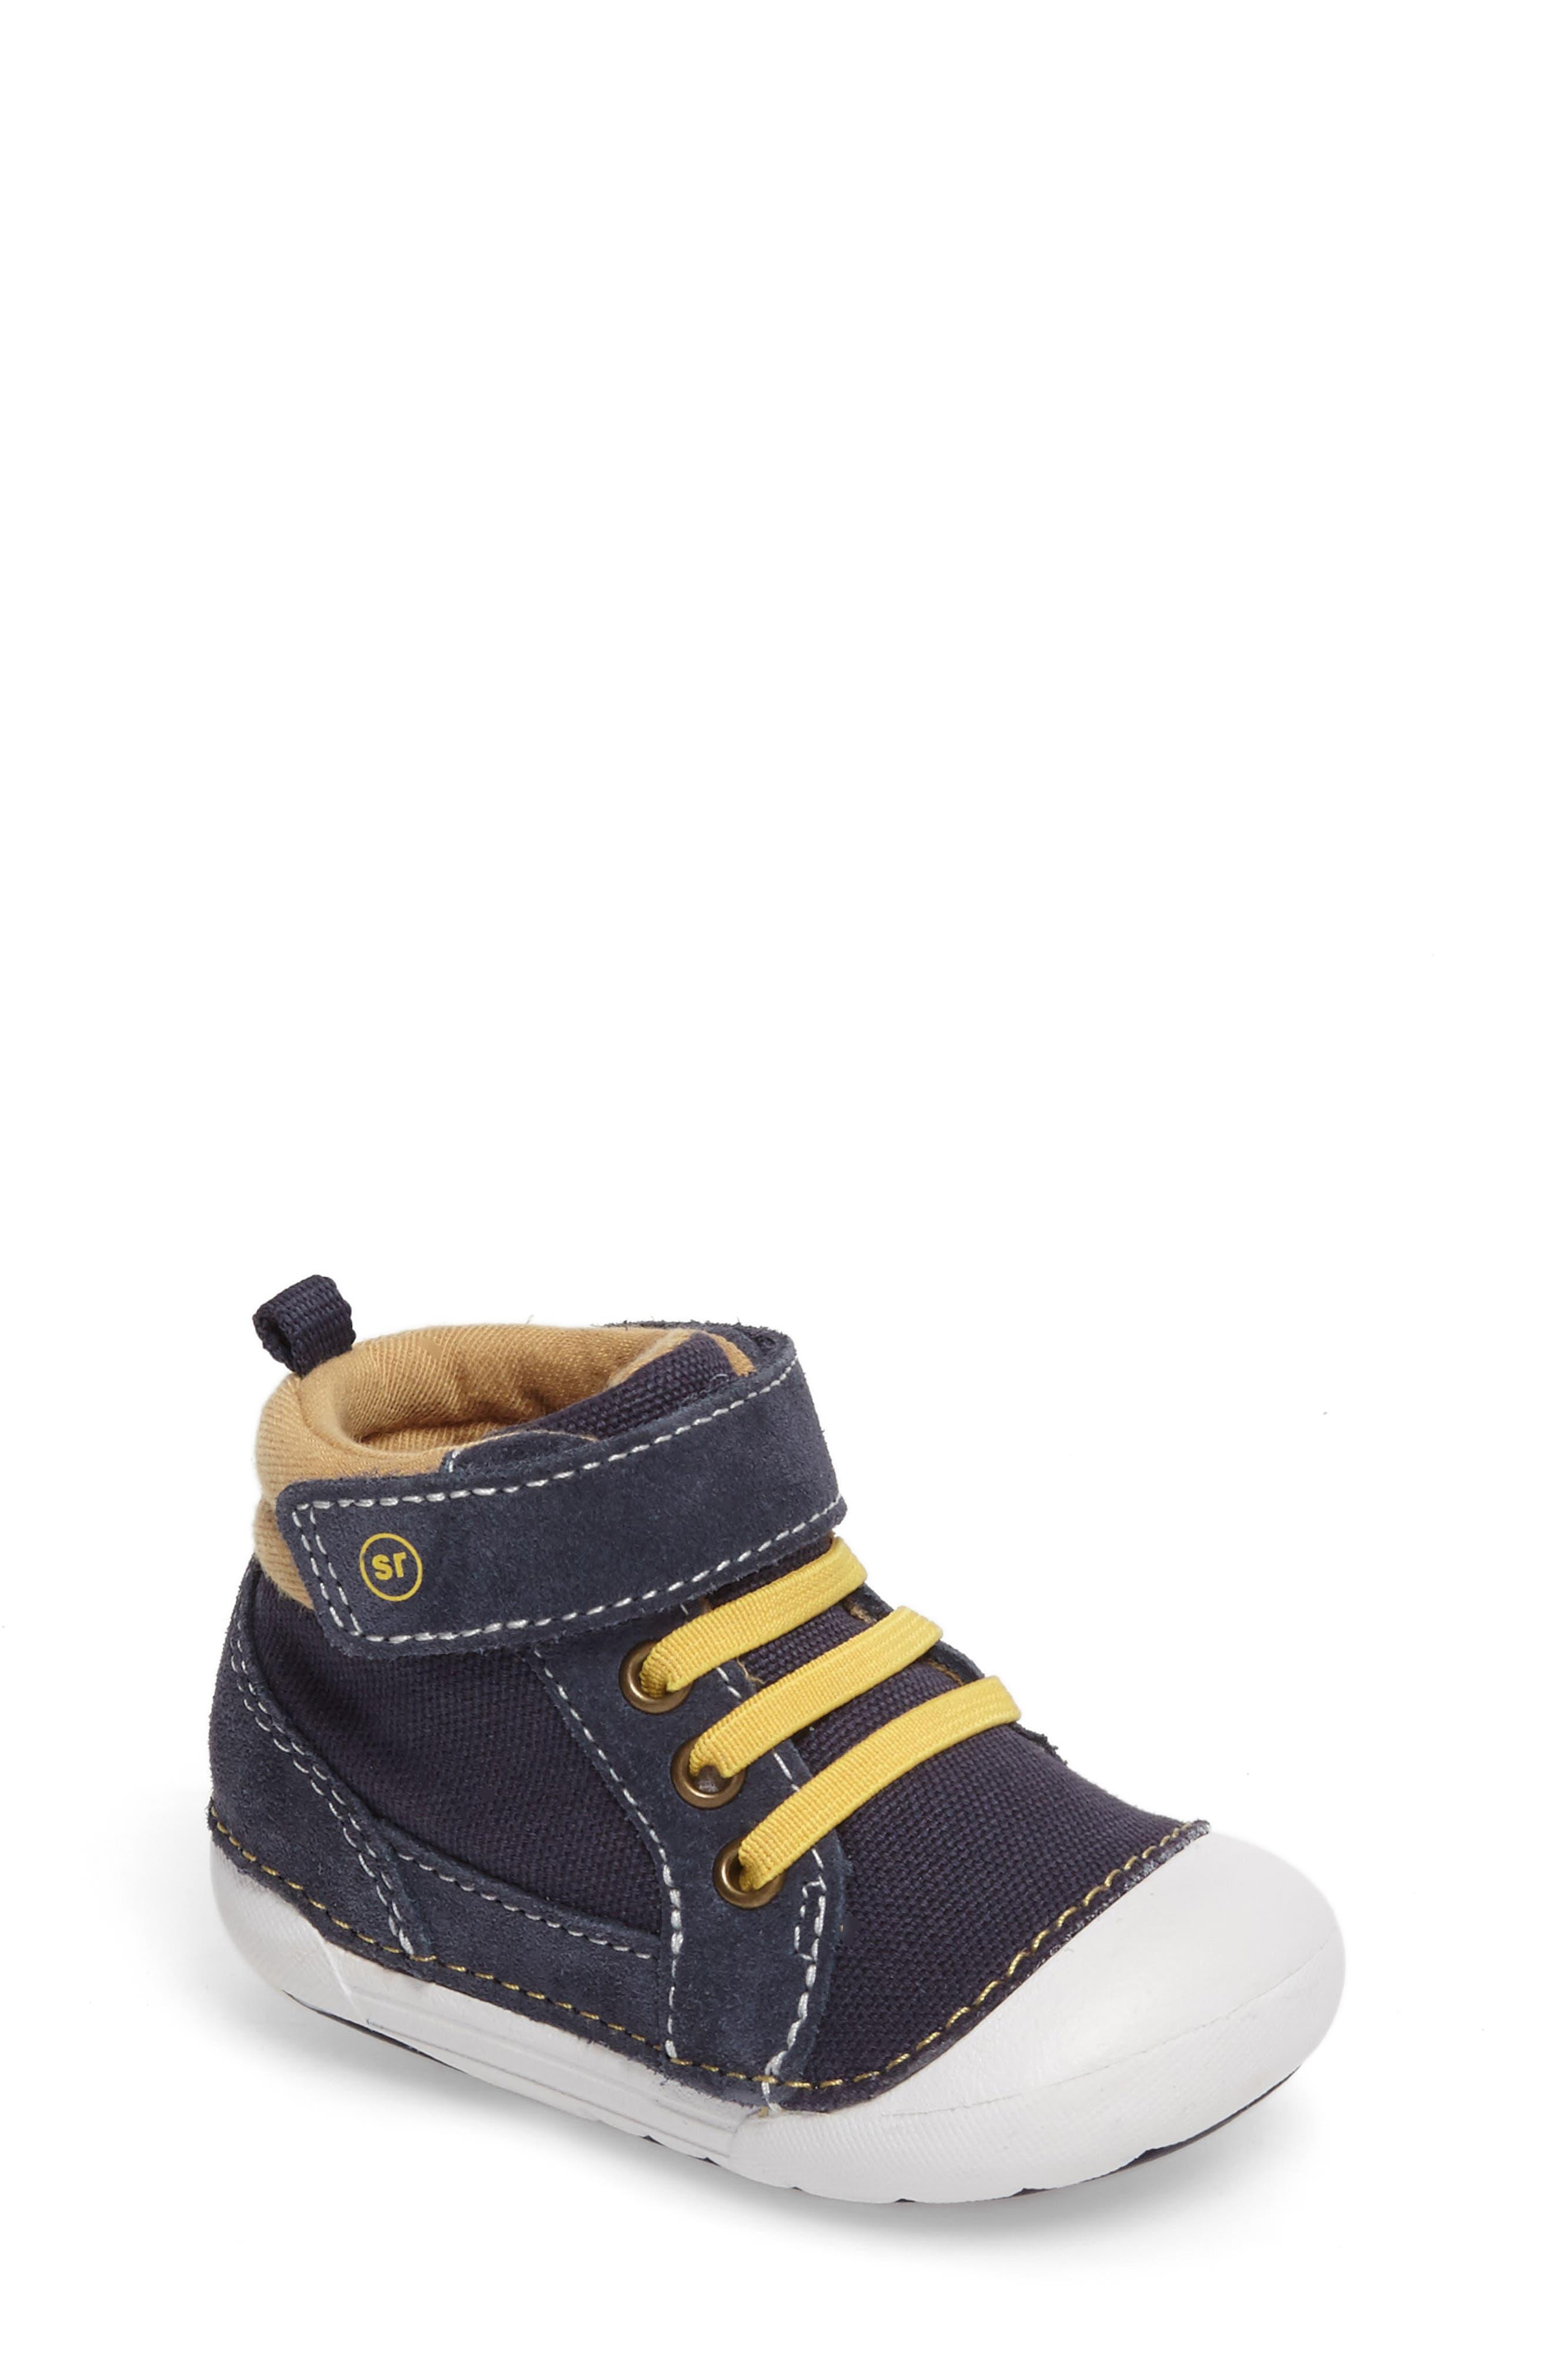 Soft Motion Danny Sneaker,                         Main,                         color, 410